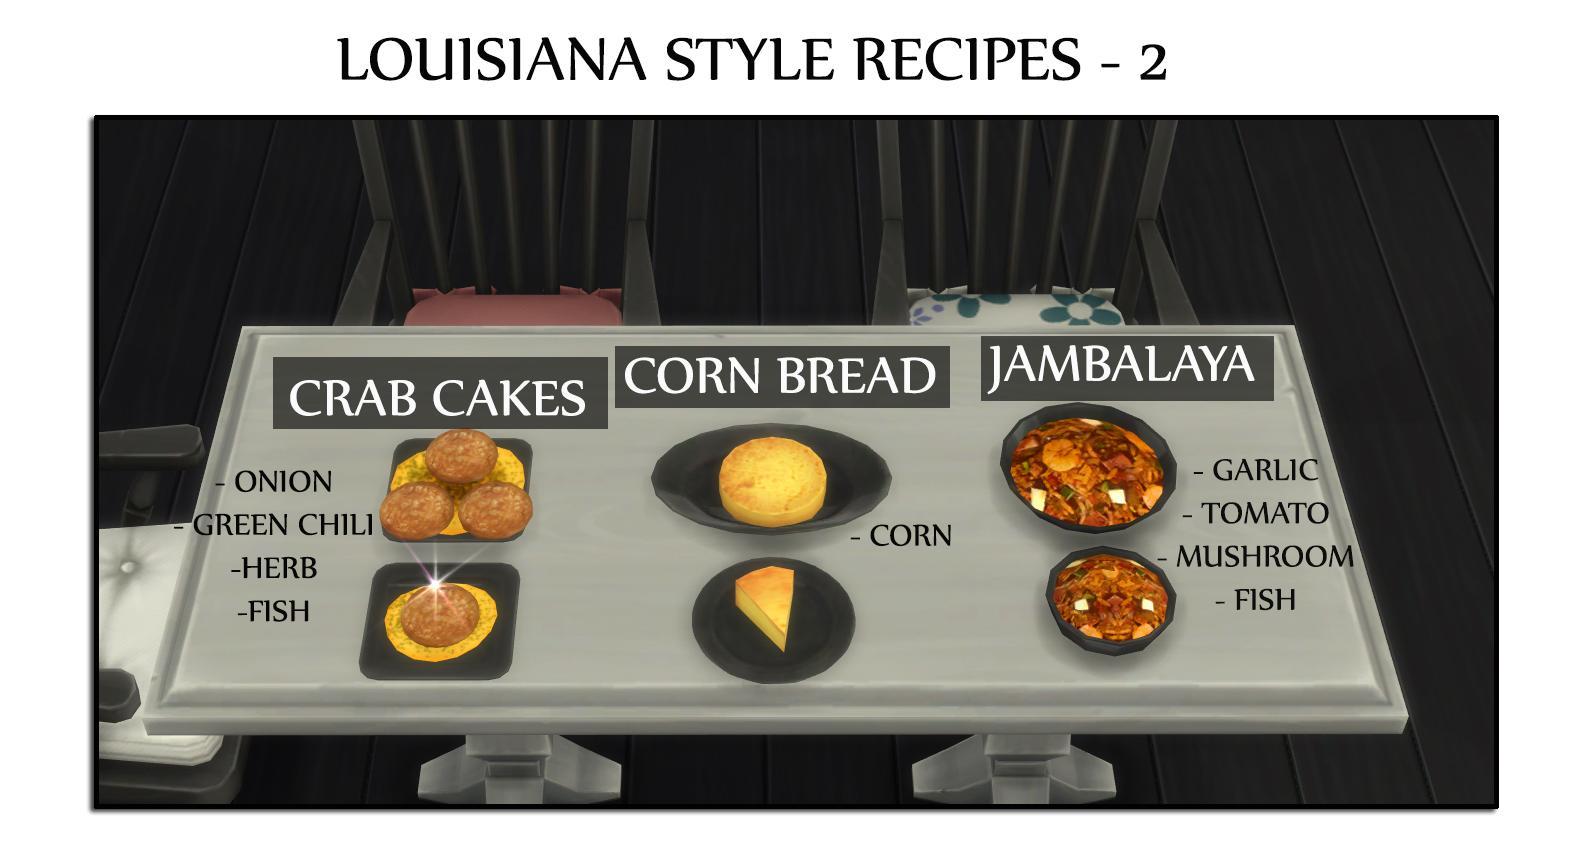 Louisiana Style Recipes 2 - Cornbread, Crabcake (Update 14.12.2019 )